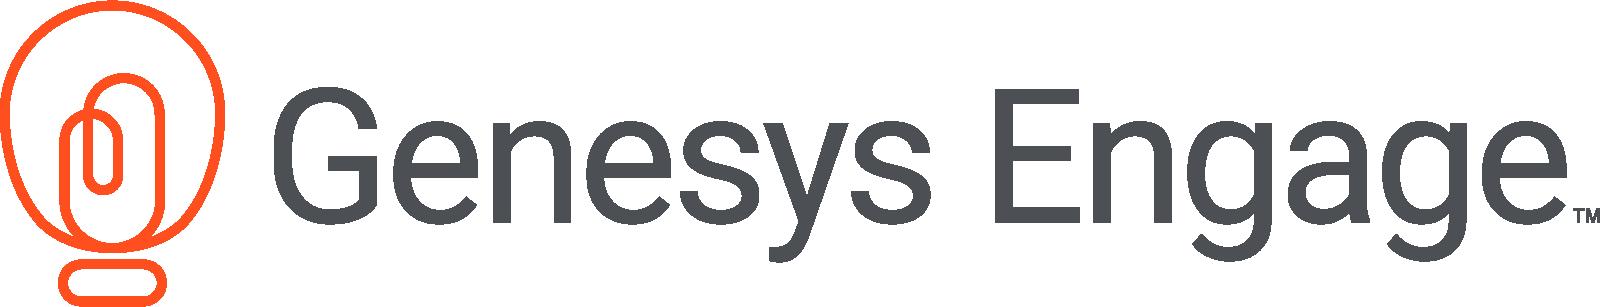 Documentation Iwd Managerhelp Welcome 8 5 0 Genesys